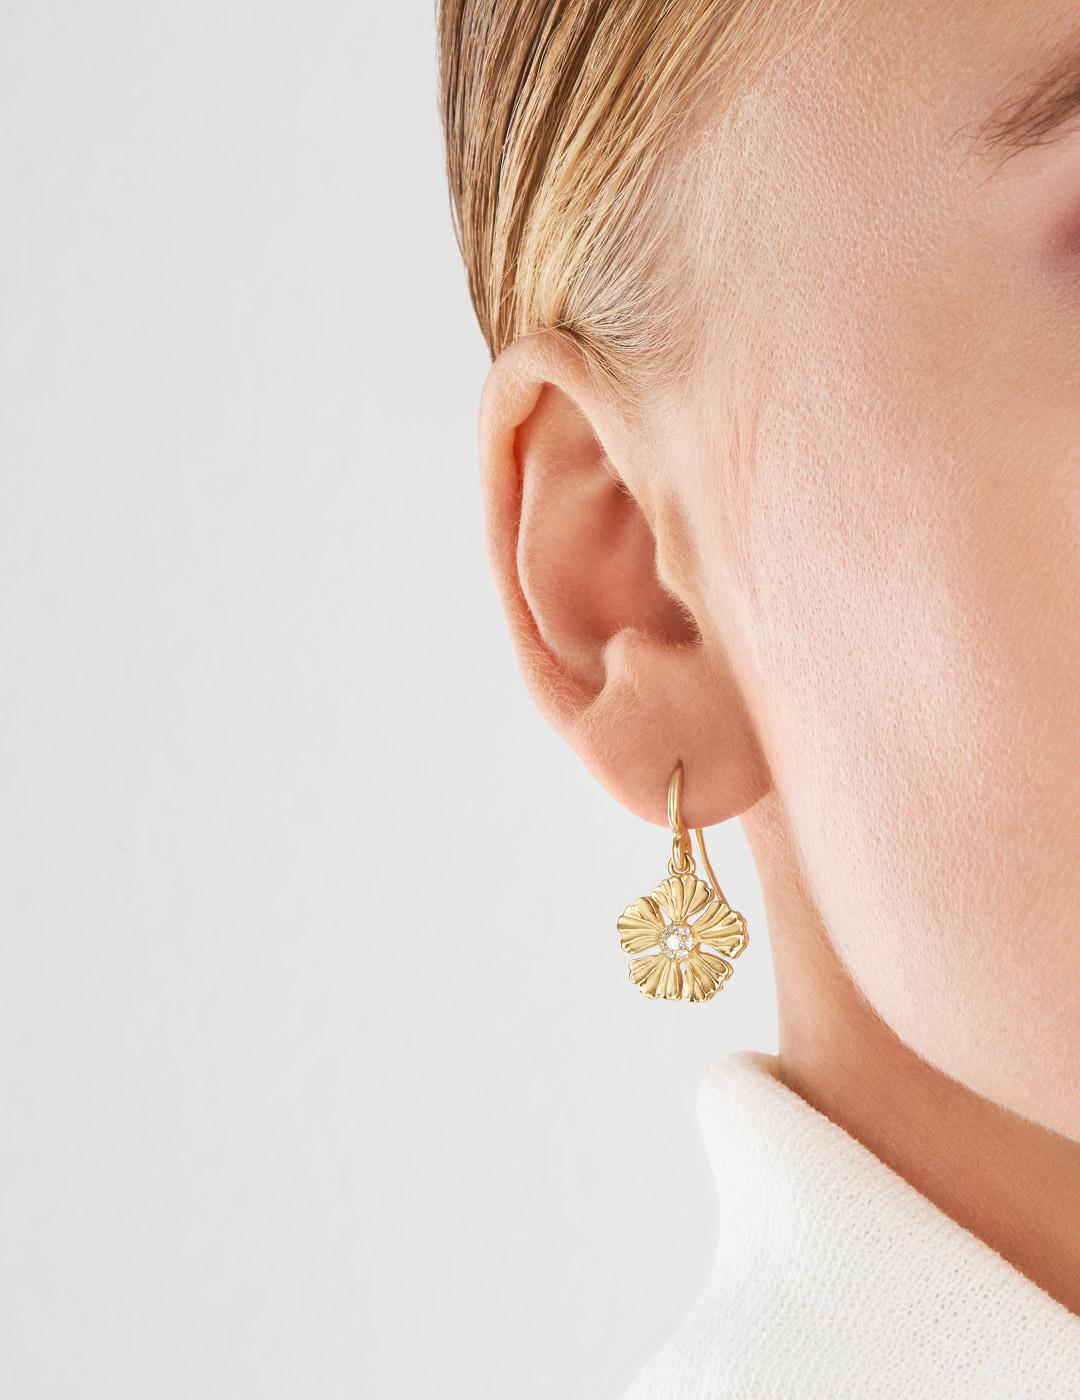 mish_products_earrings_StrwFlwer-XL-FW-2